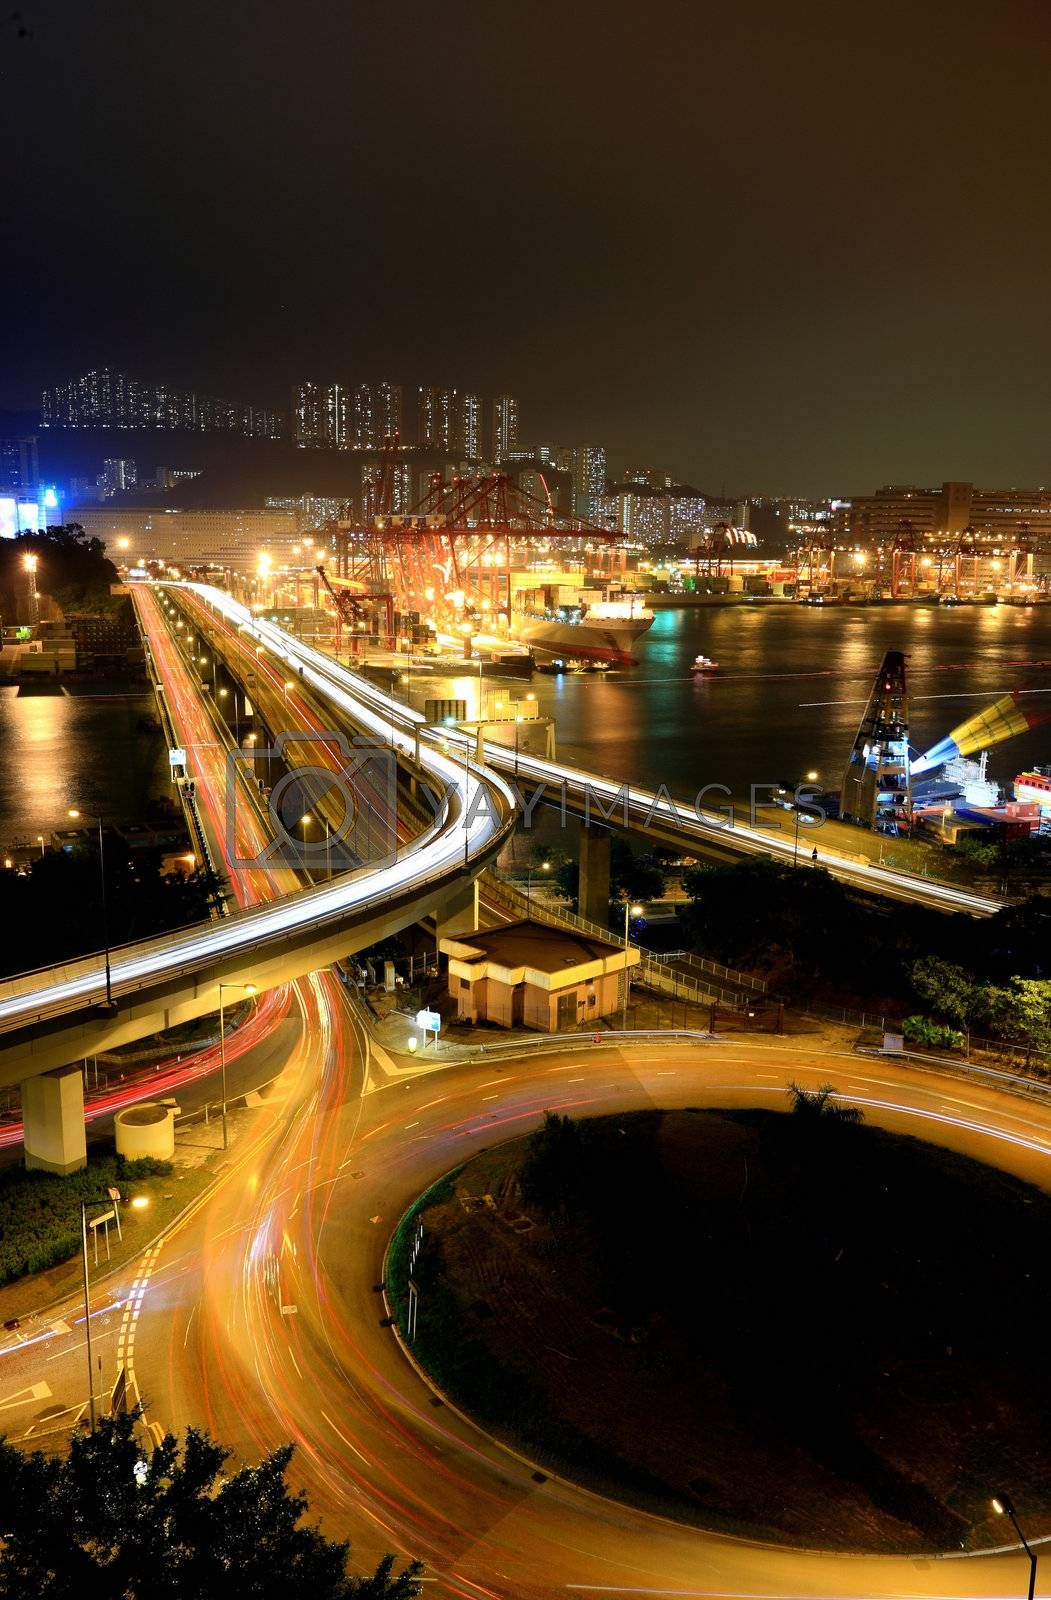 Royalty free image of highway in Hong Kong by leungchopan